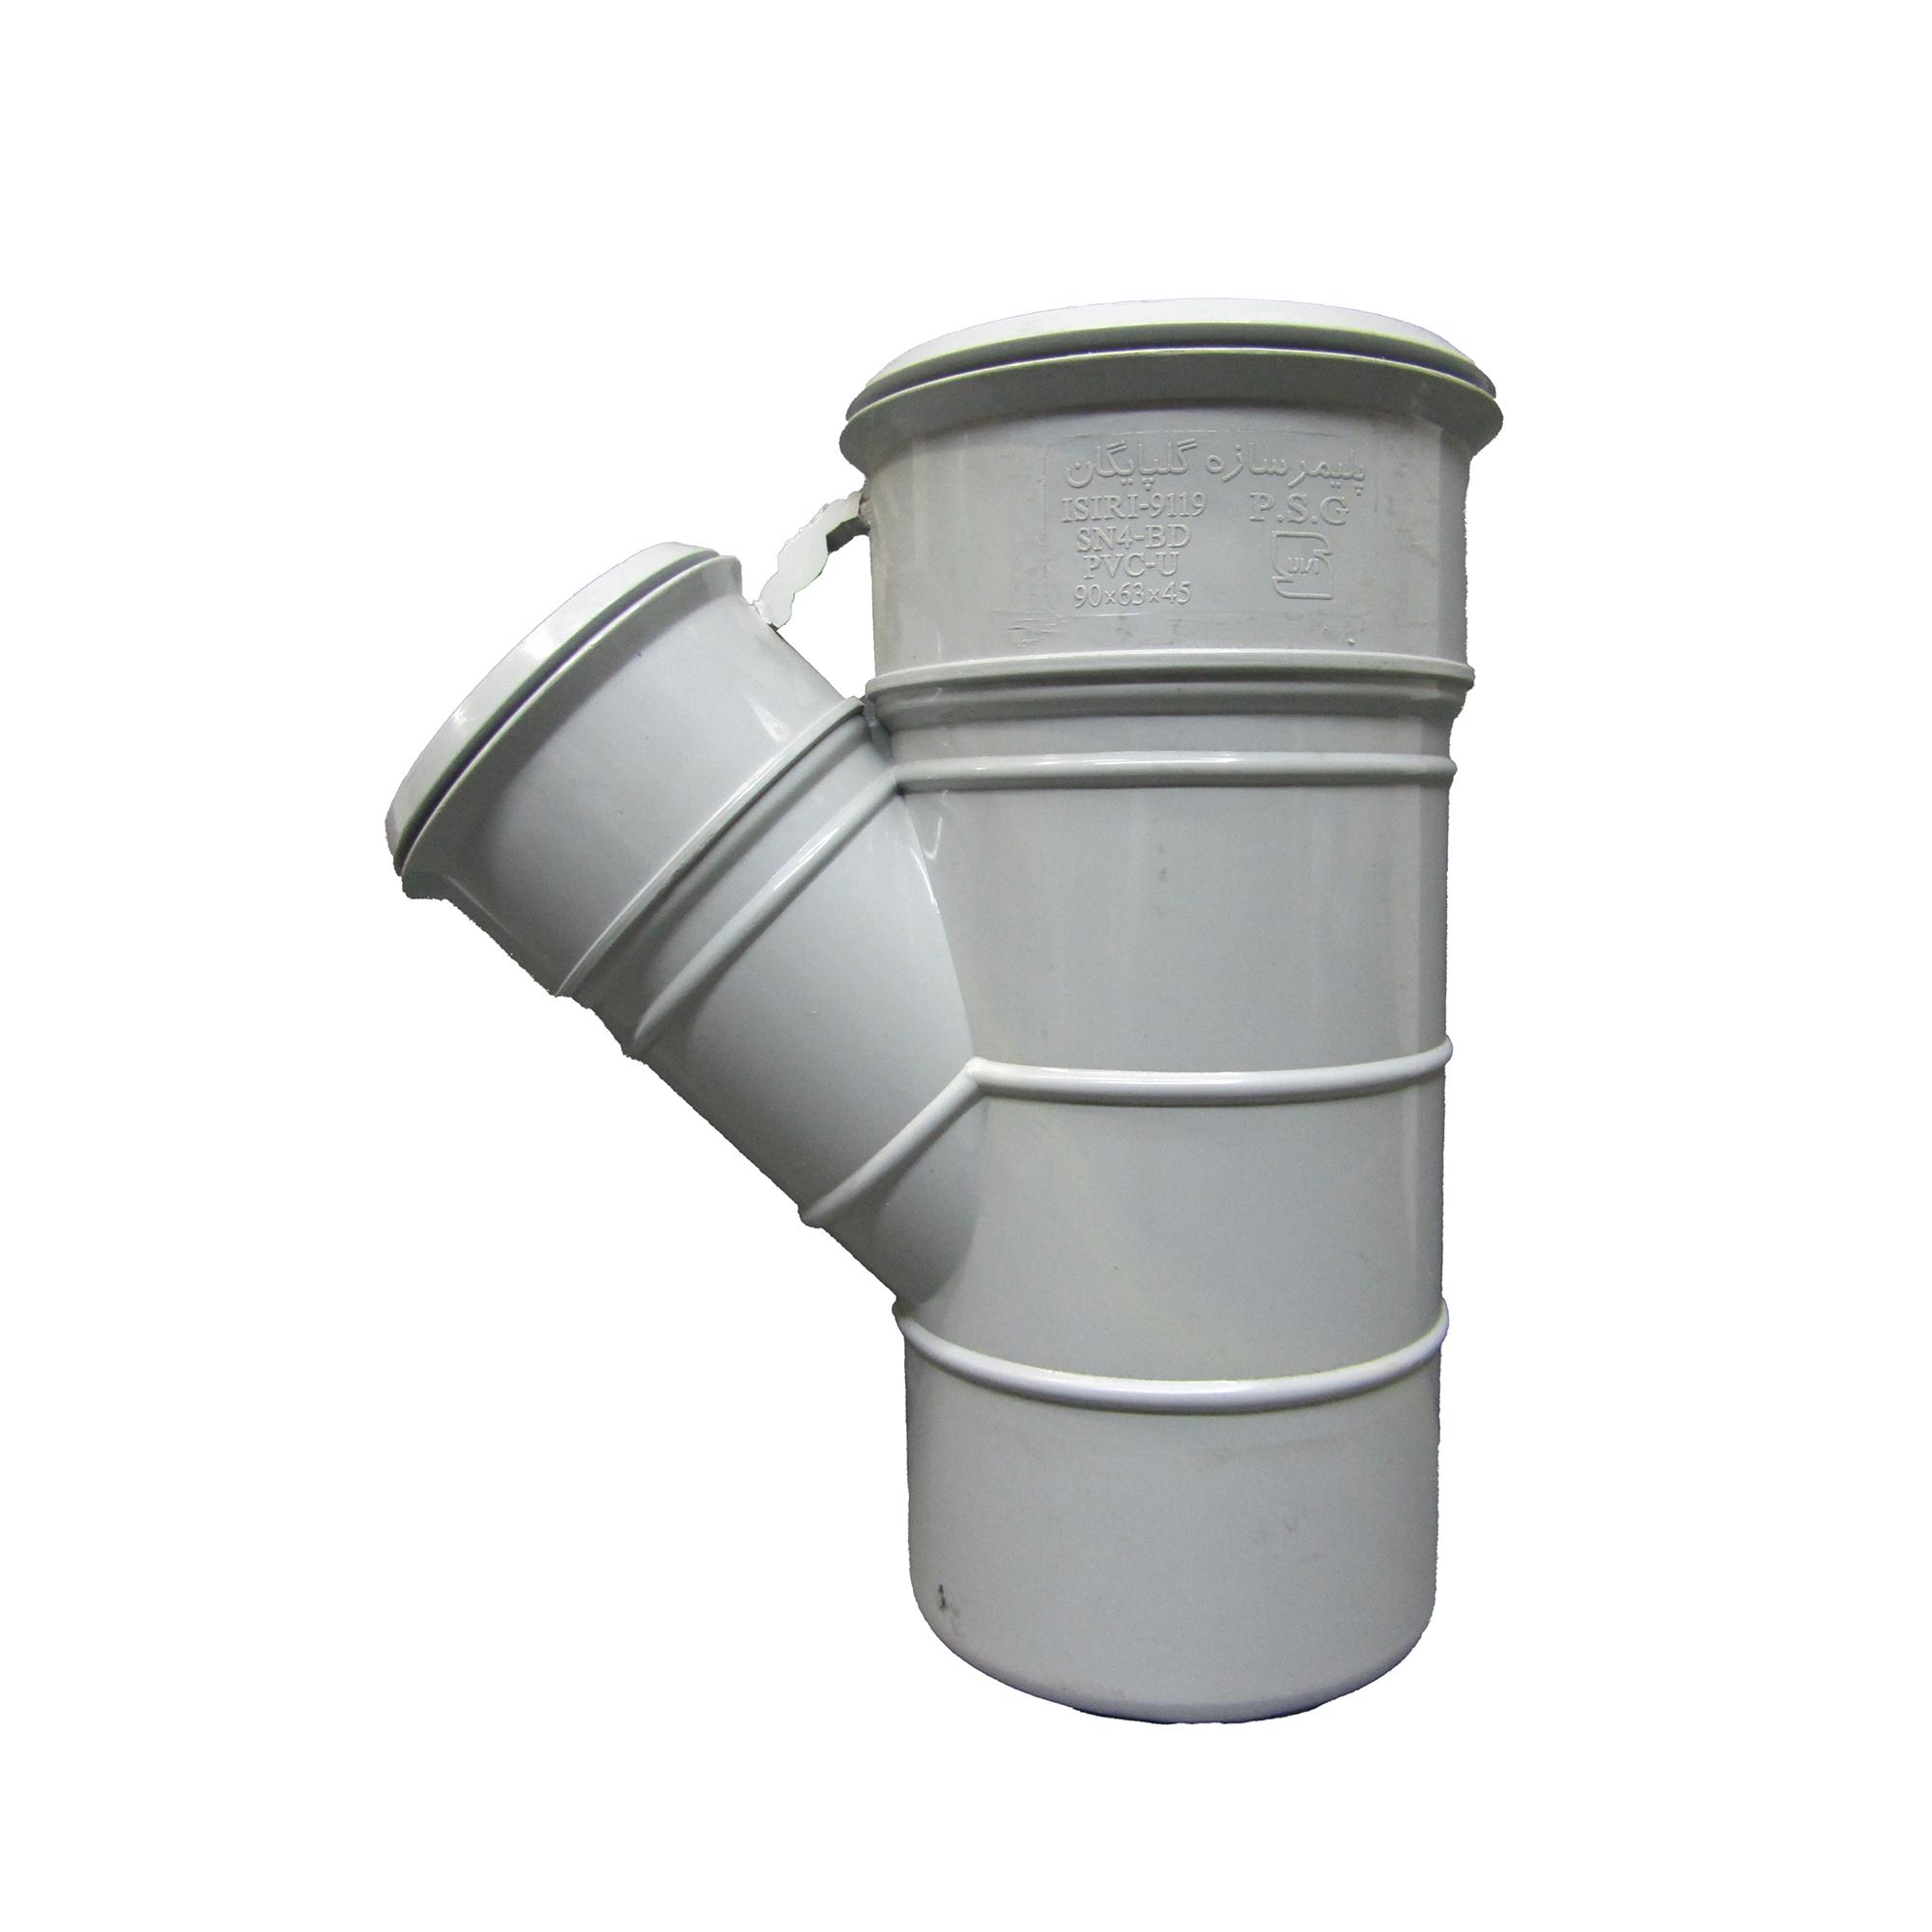 قیمت                                      سه راهی پلیمر سازه گلپایگان کد ۹۰۶۳